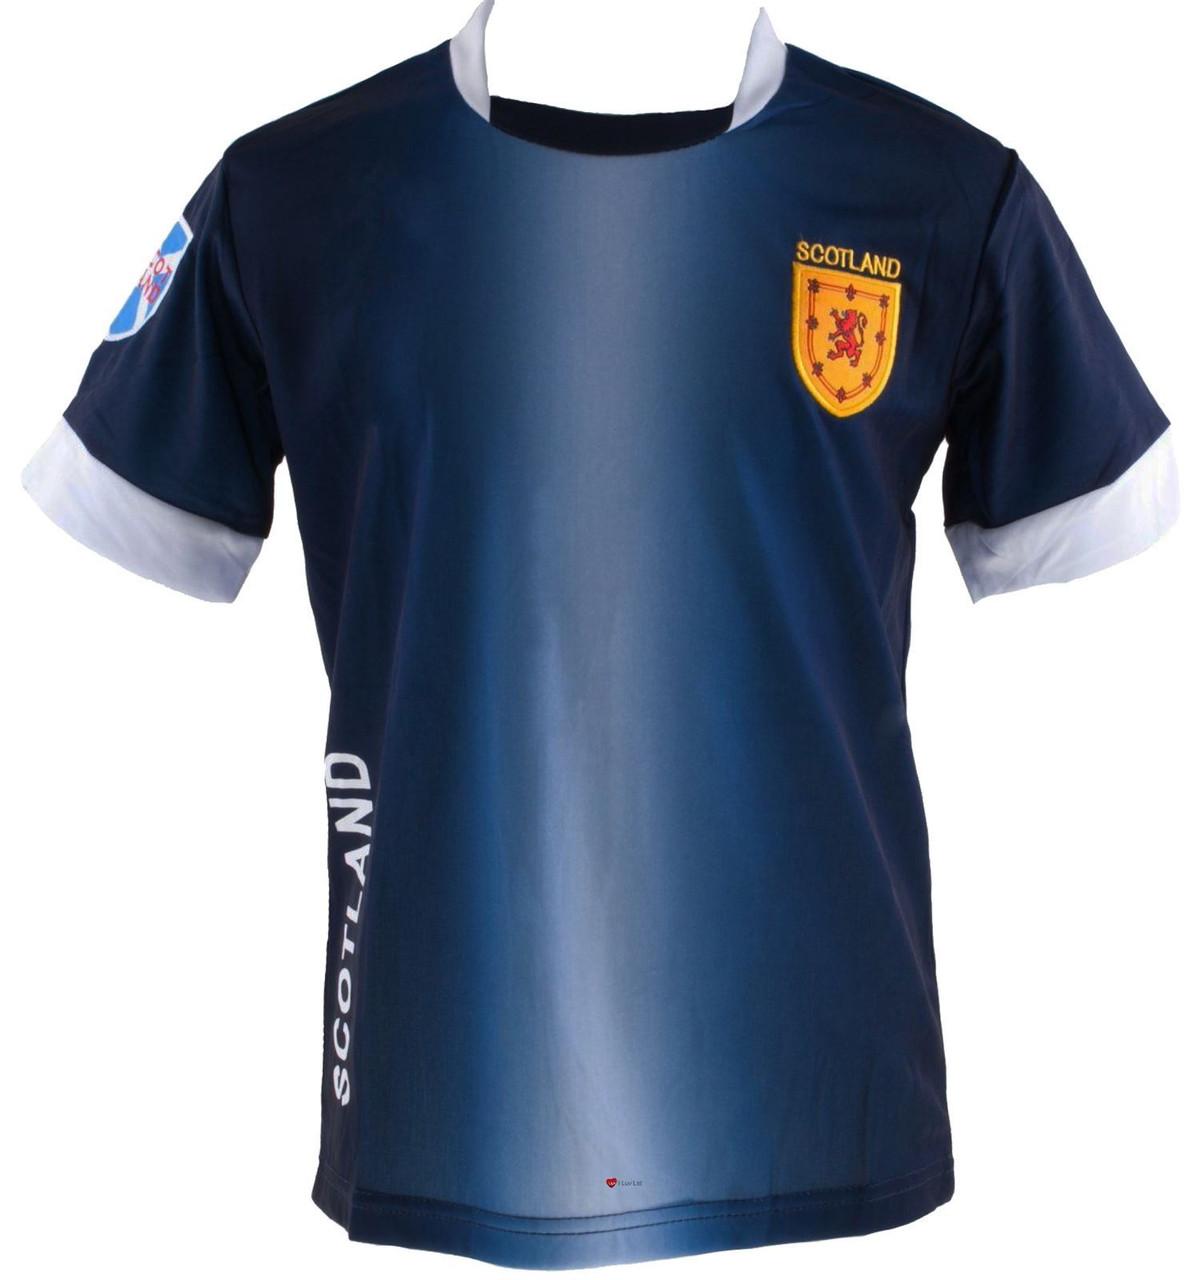 0e04ad4db Kids Scotland Scottish Football T-Shirt Top Navy White Lion Rampant Badge  4-5 ...